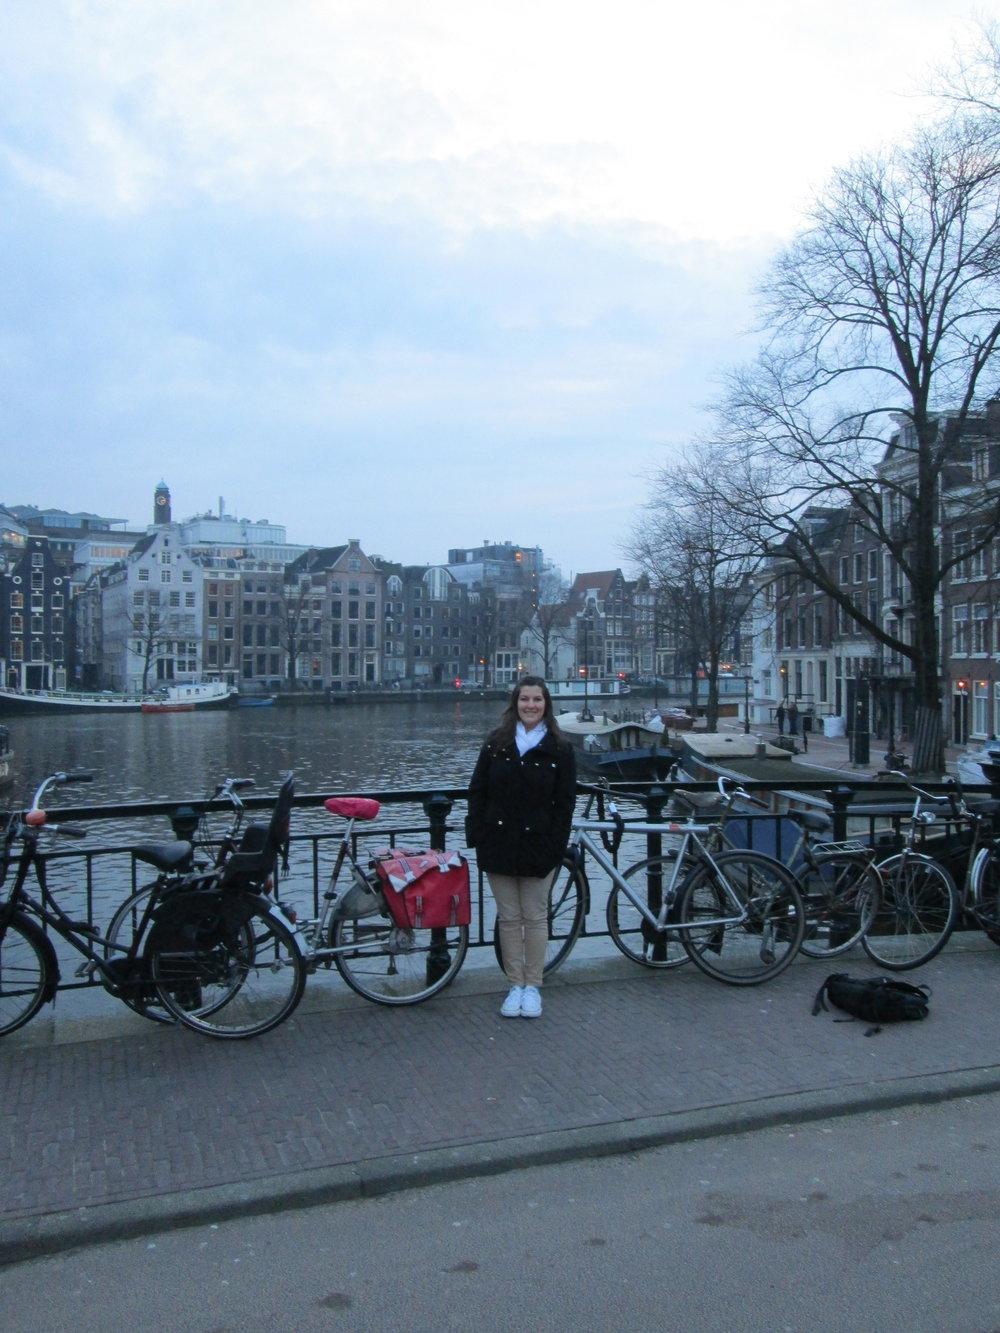 Amsterdam in the winter.